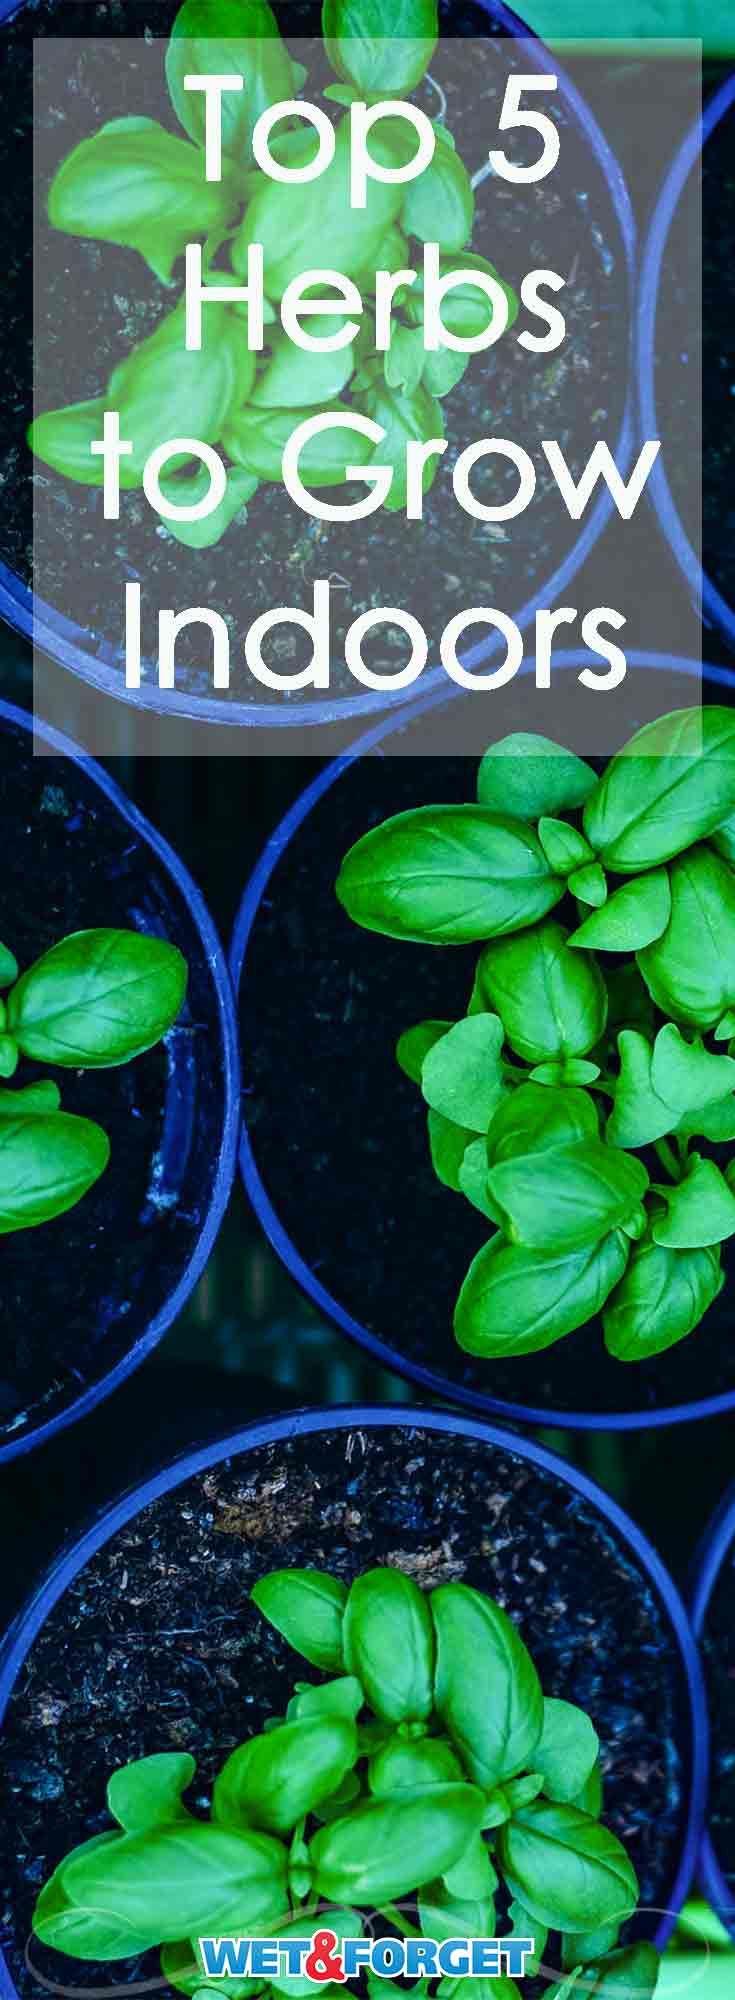 best 25 growing herbs indoors ideas on pinterest growing plants indoors how to grow herbs. Black Bedroom Furniture Sets. Home Design Ideas